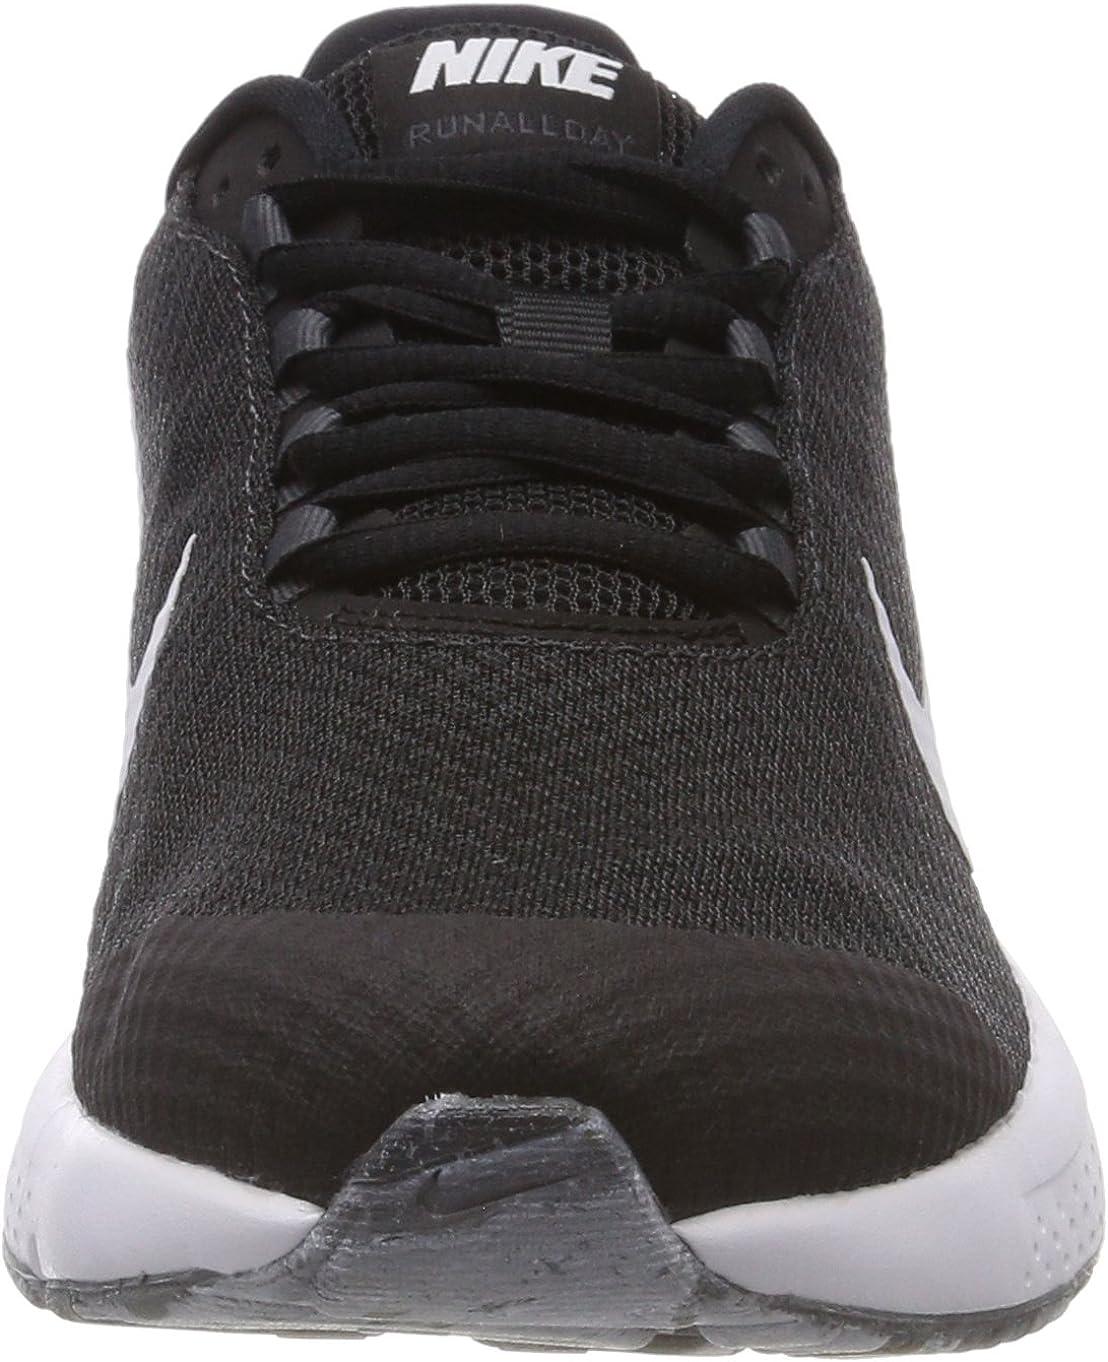 Nike Runallday, Scarpe Running Uomo: Amazon.it: Scarpe e borse